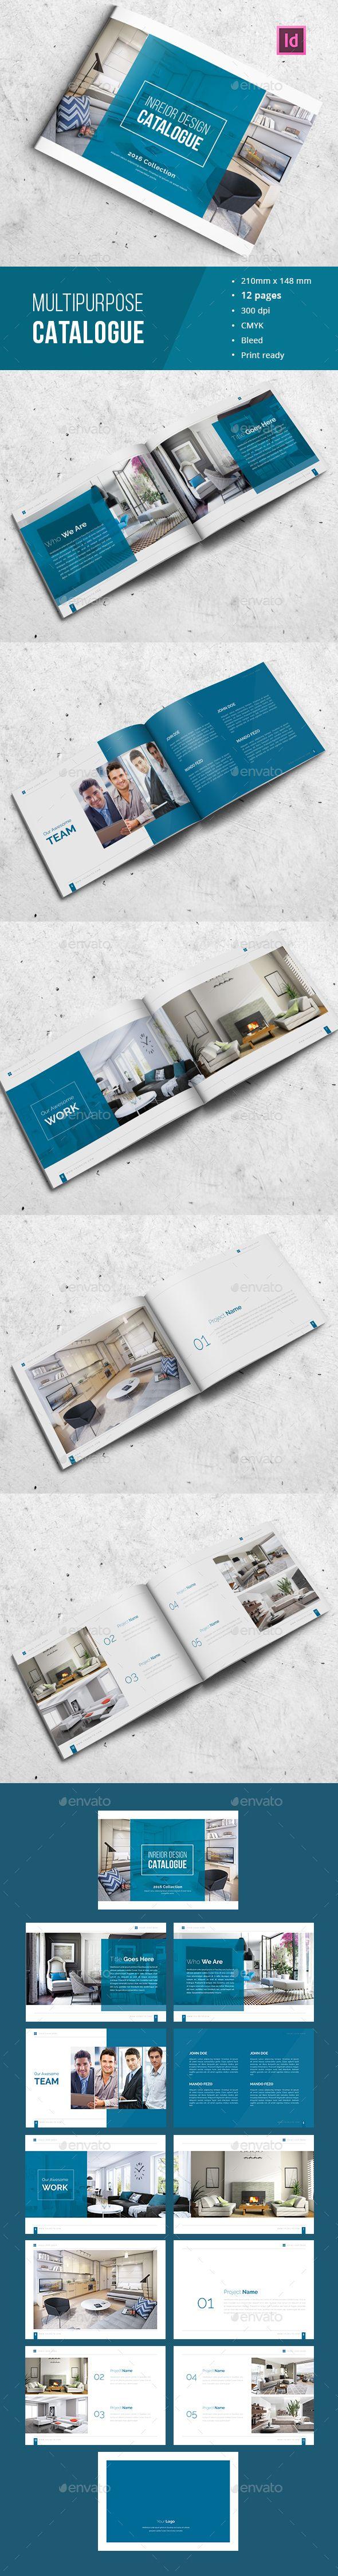 Minimal A5 Catalogue 02 - Catalogs Brochures